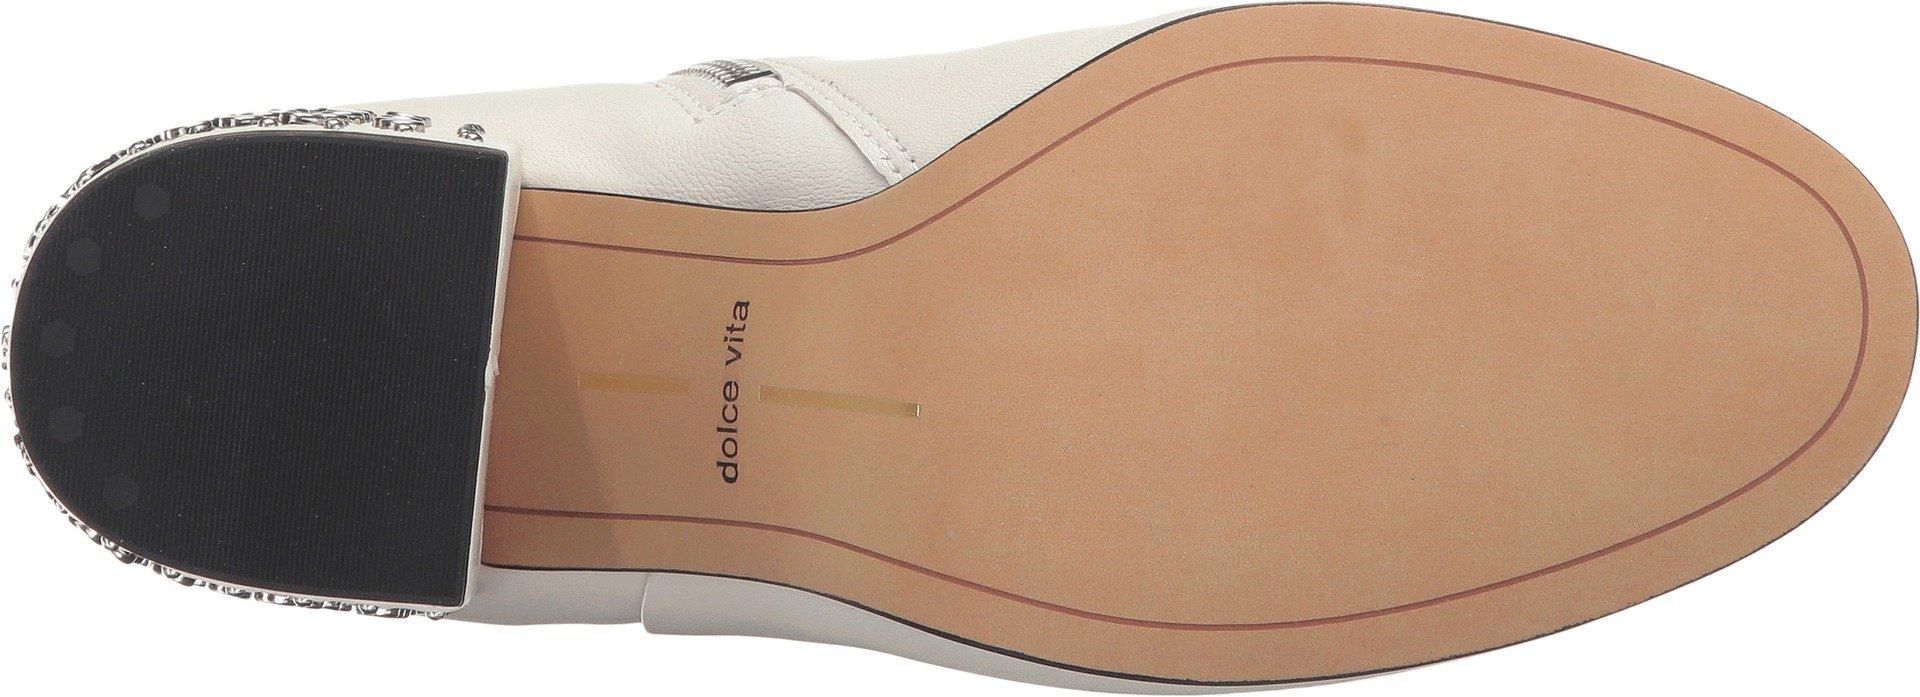 Dolce Vita Women's Olin Fashion Boot, Off White Leather, 6.5 Medium US